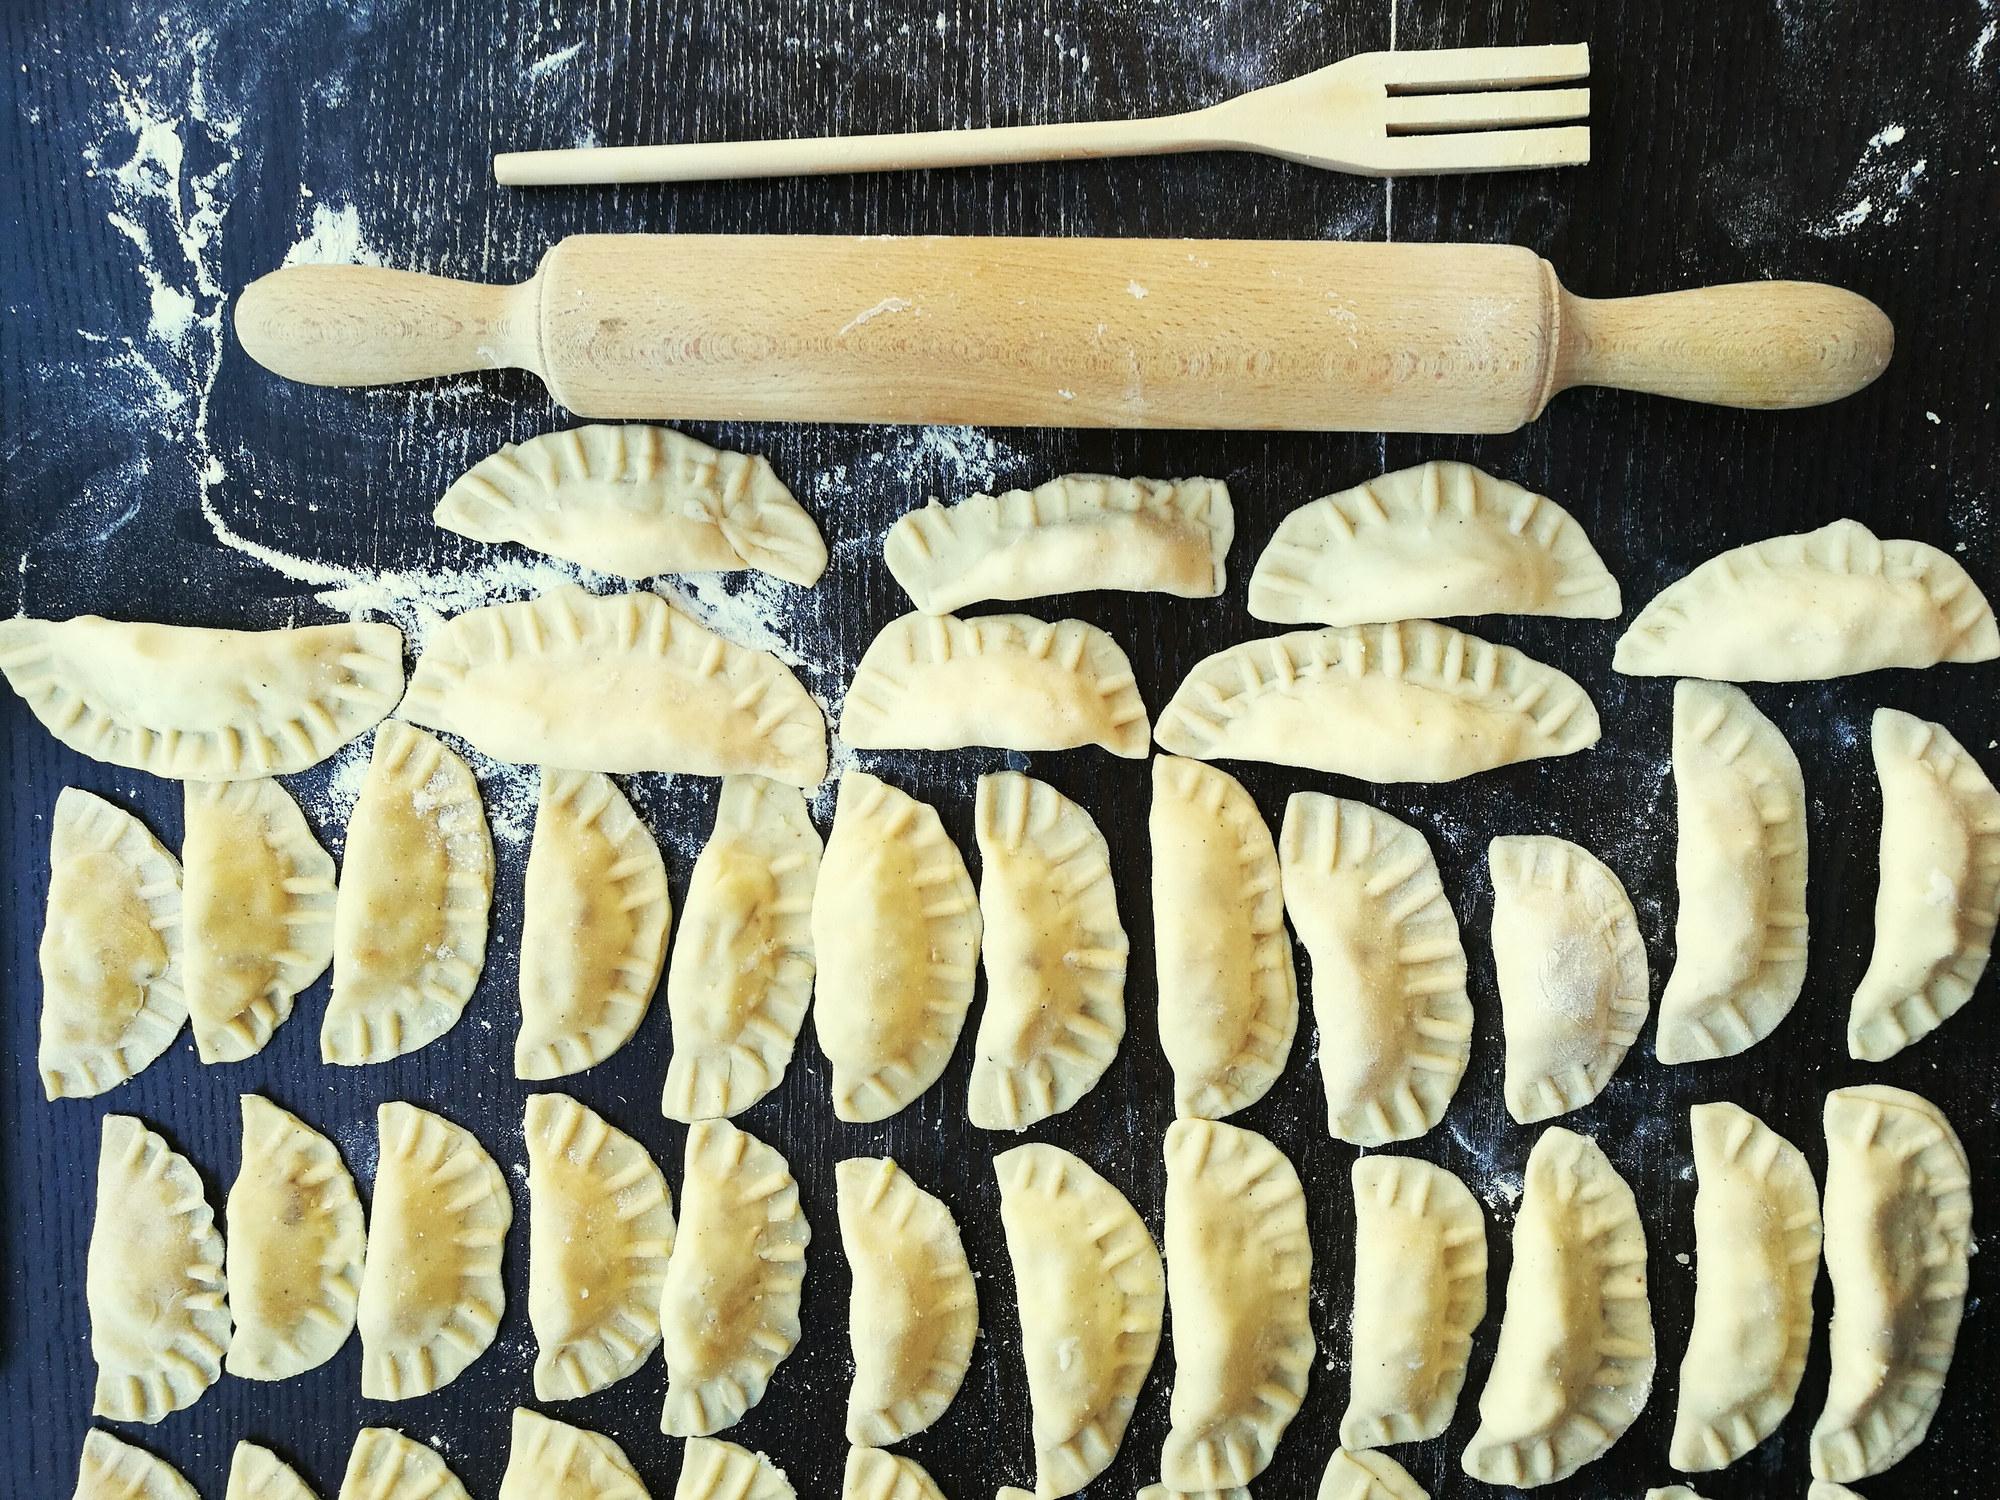 A tabletop of uncooked pierogis aka Polish dumplings.